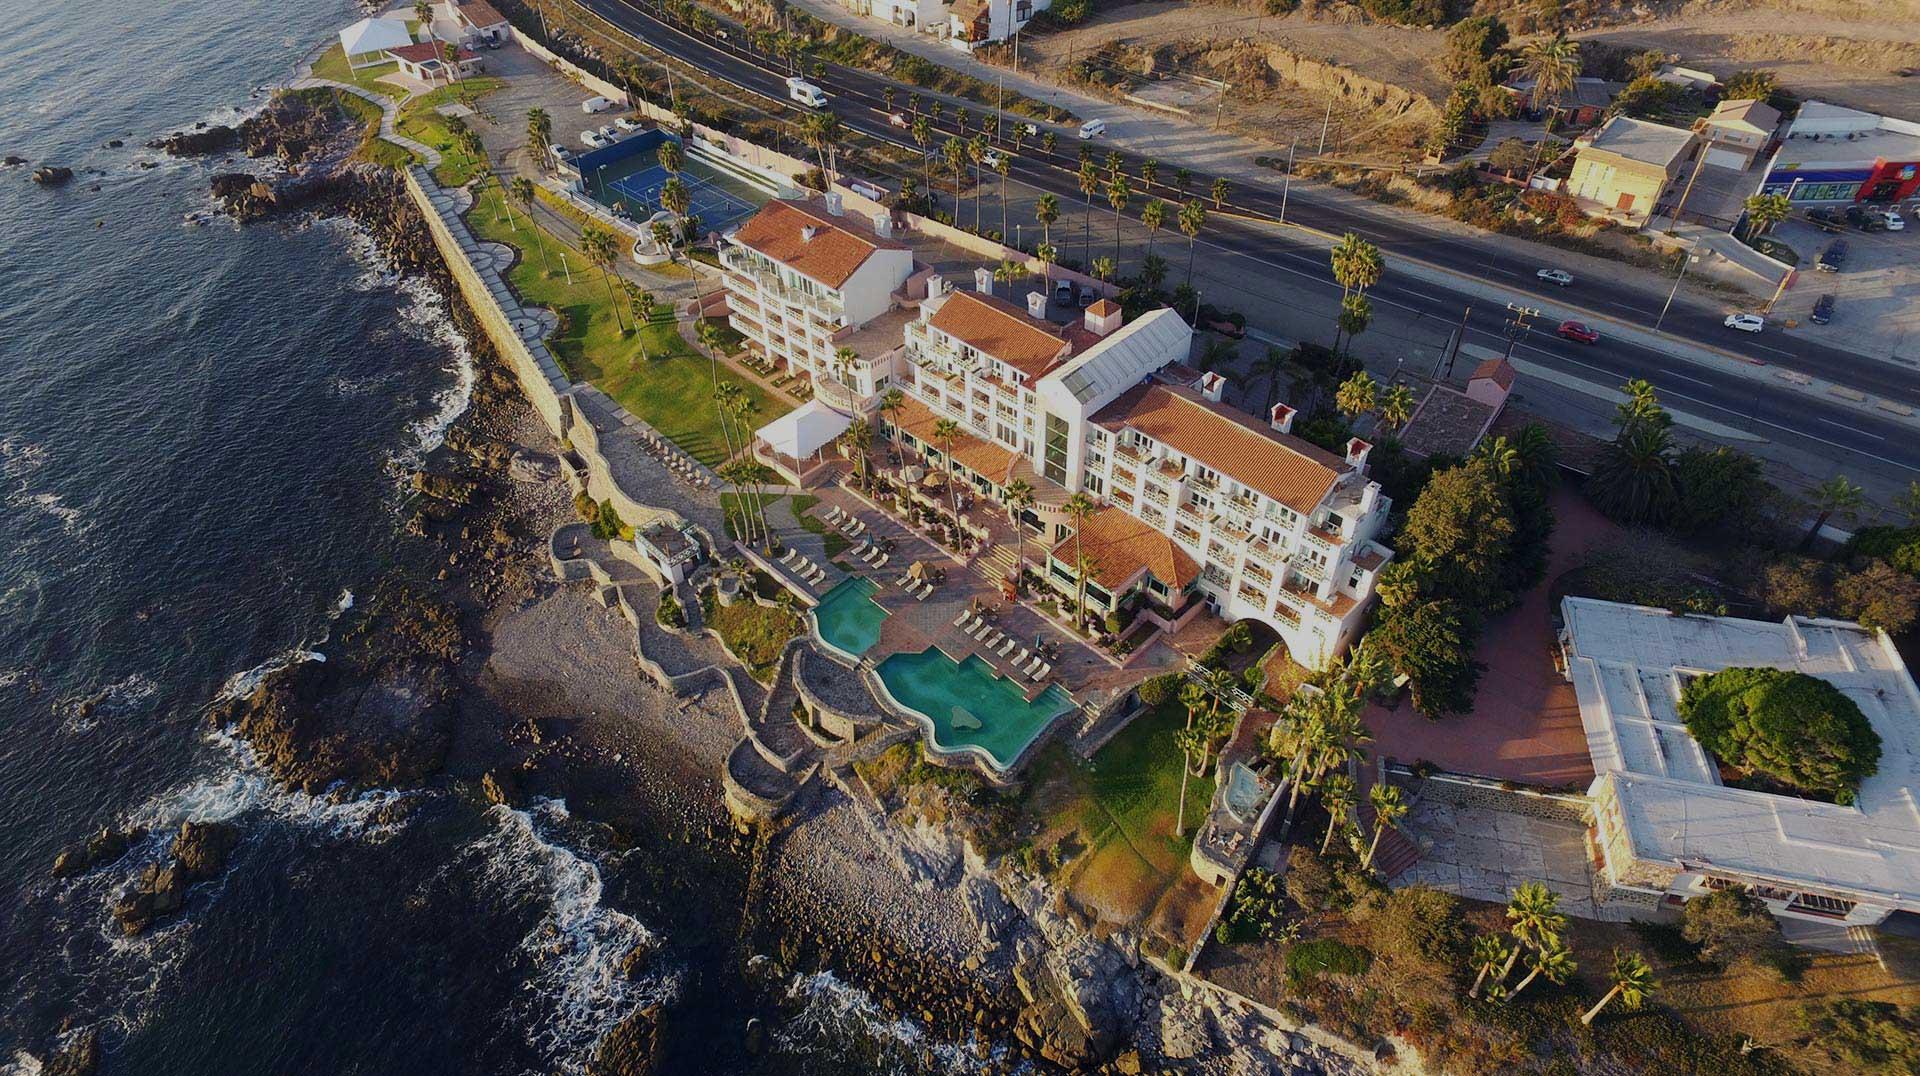 Las Rosas Hotel Ensenada